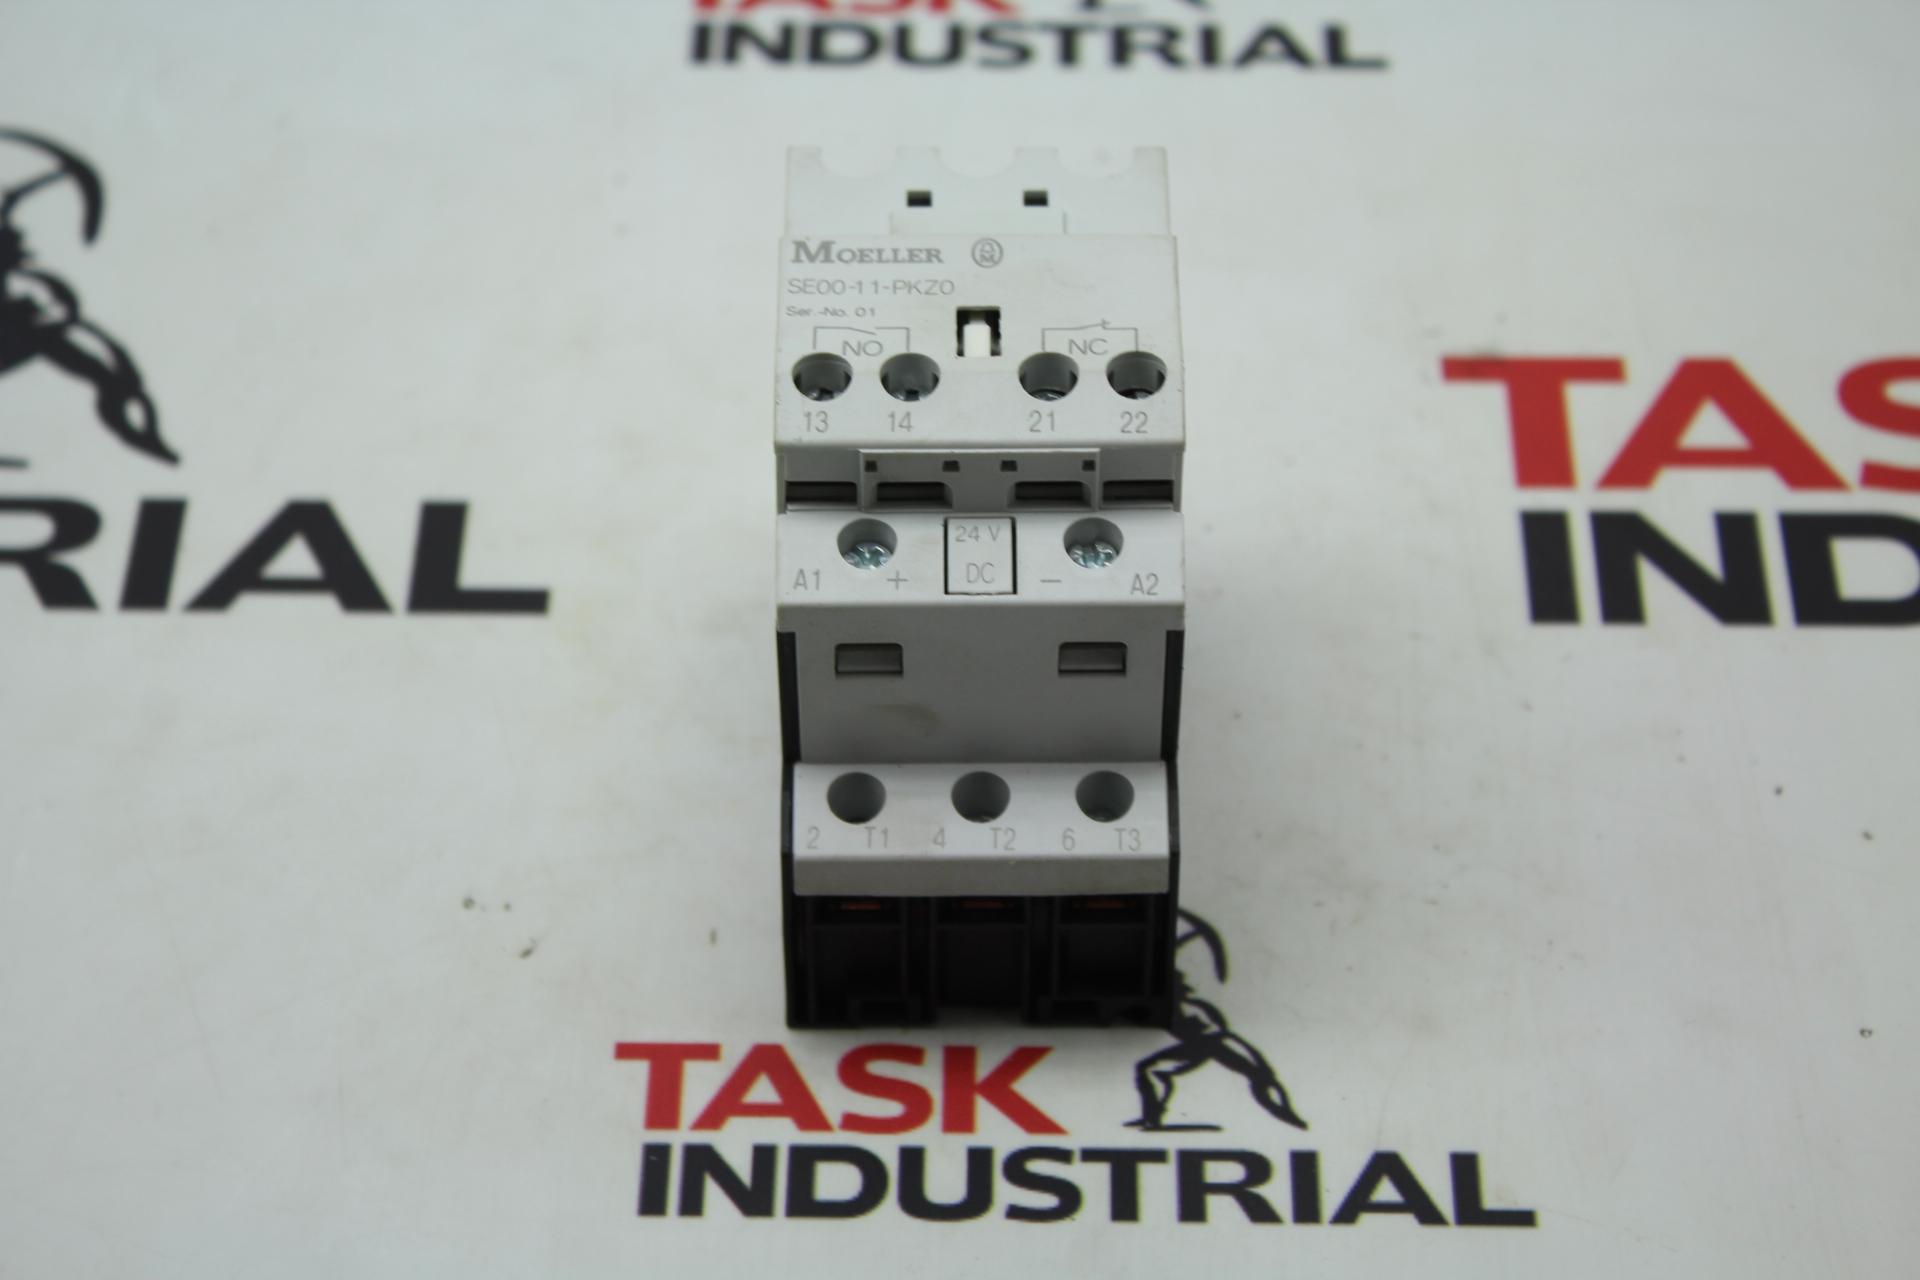 Moeller SE00-11-PKZ0